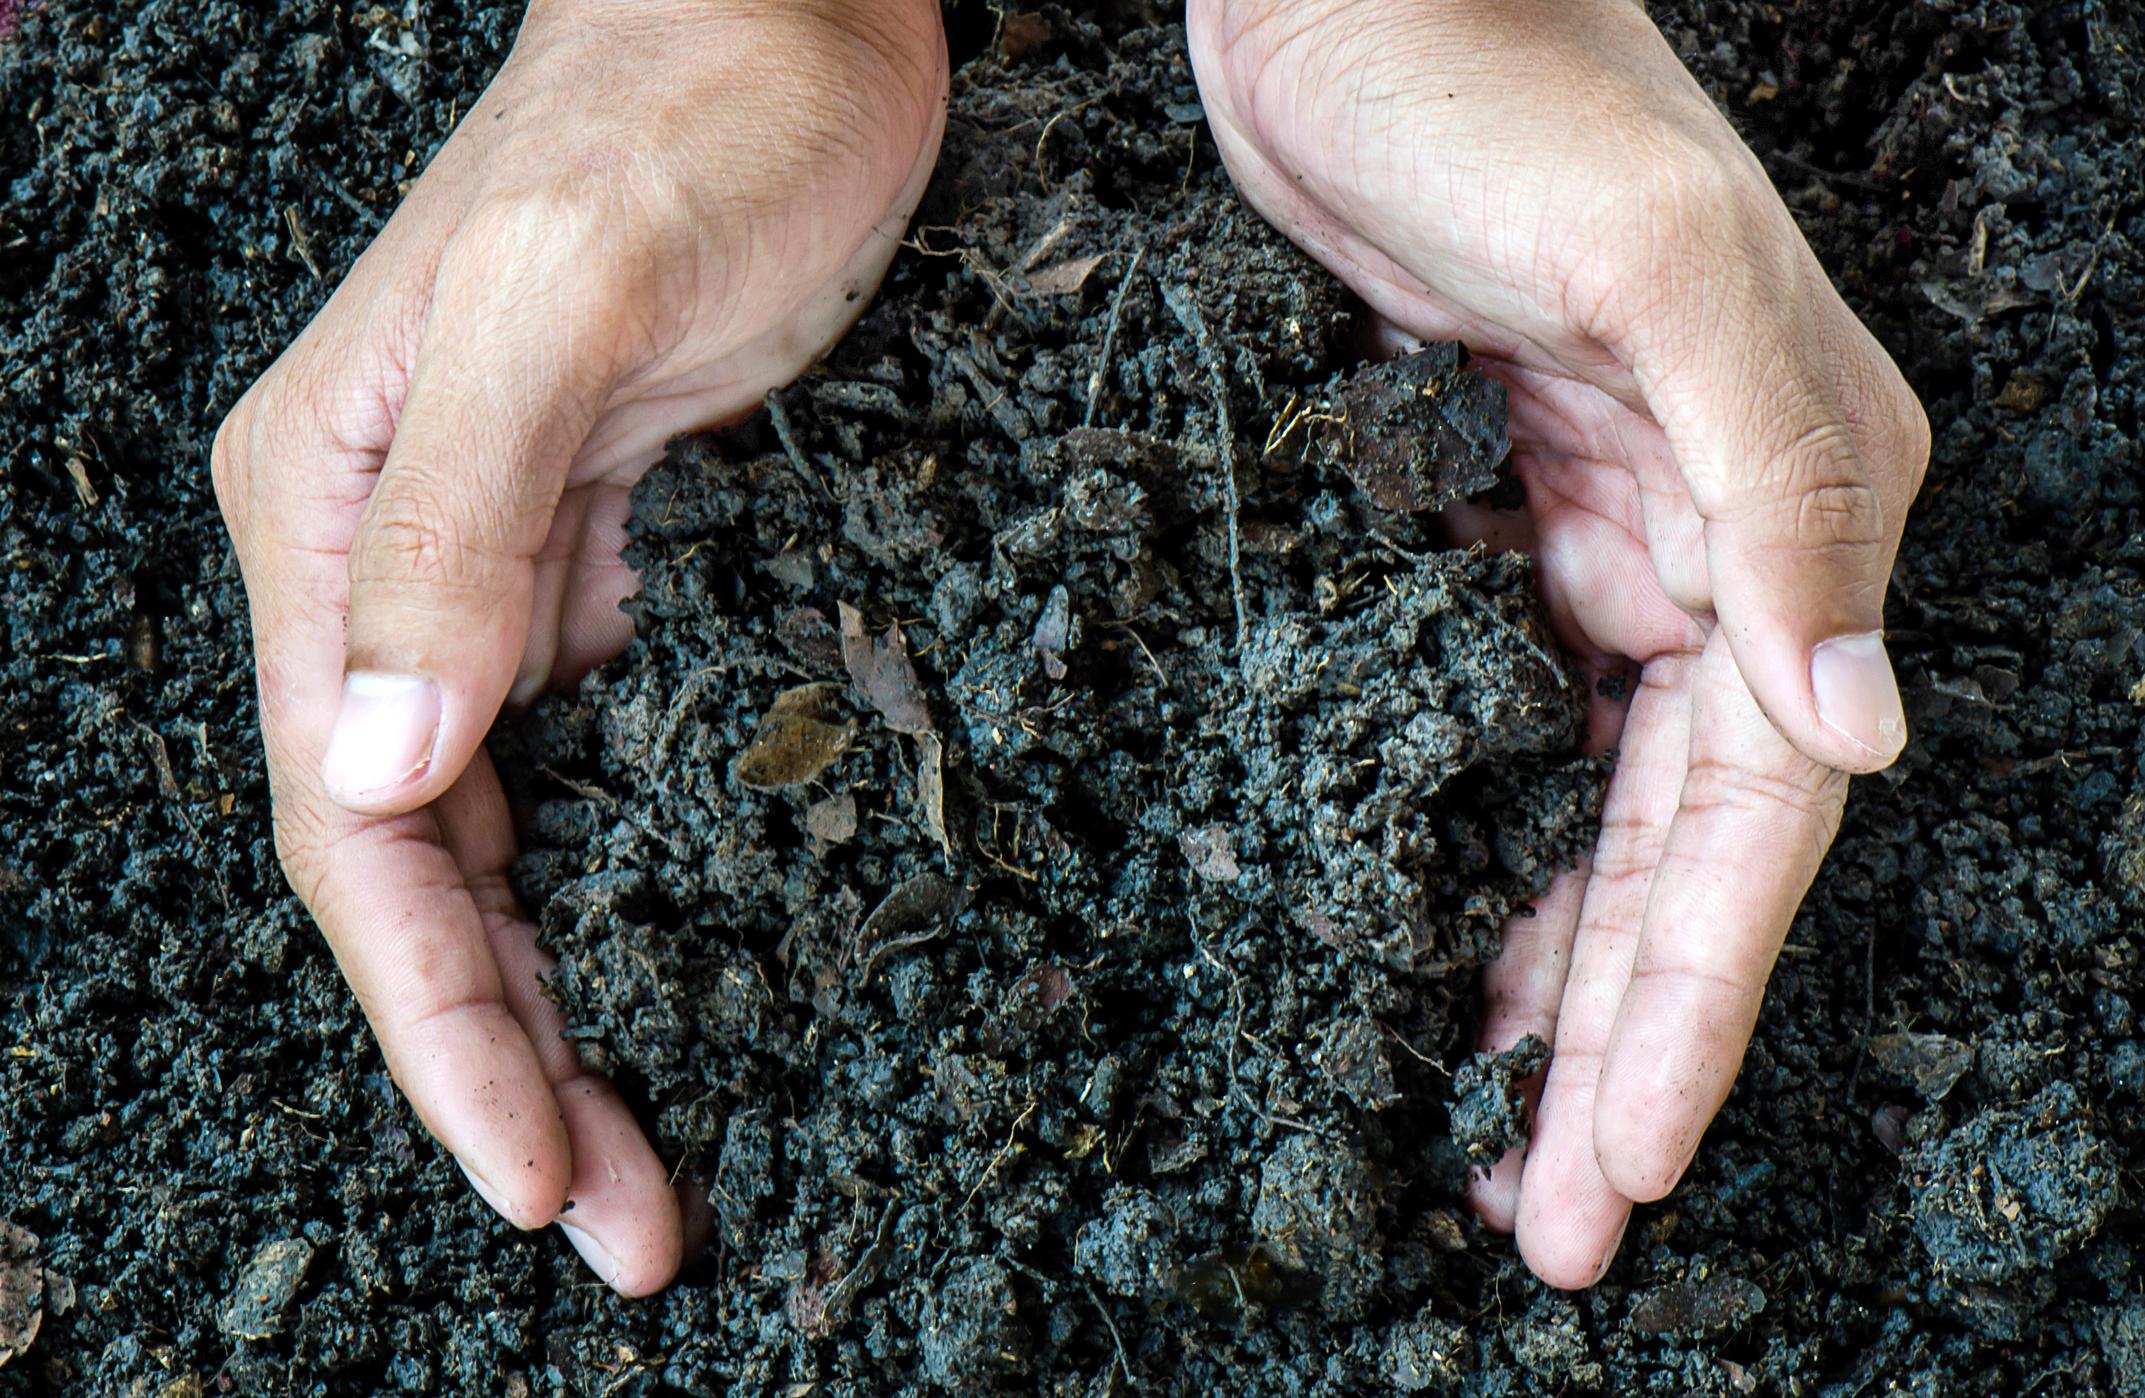 10 Ways to Conserve Soil | LoveToKnow